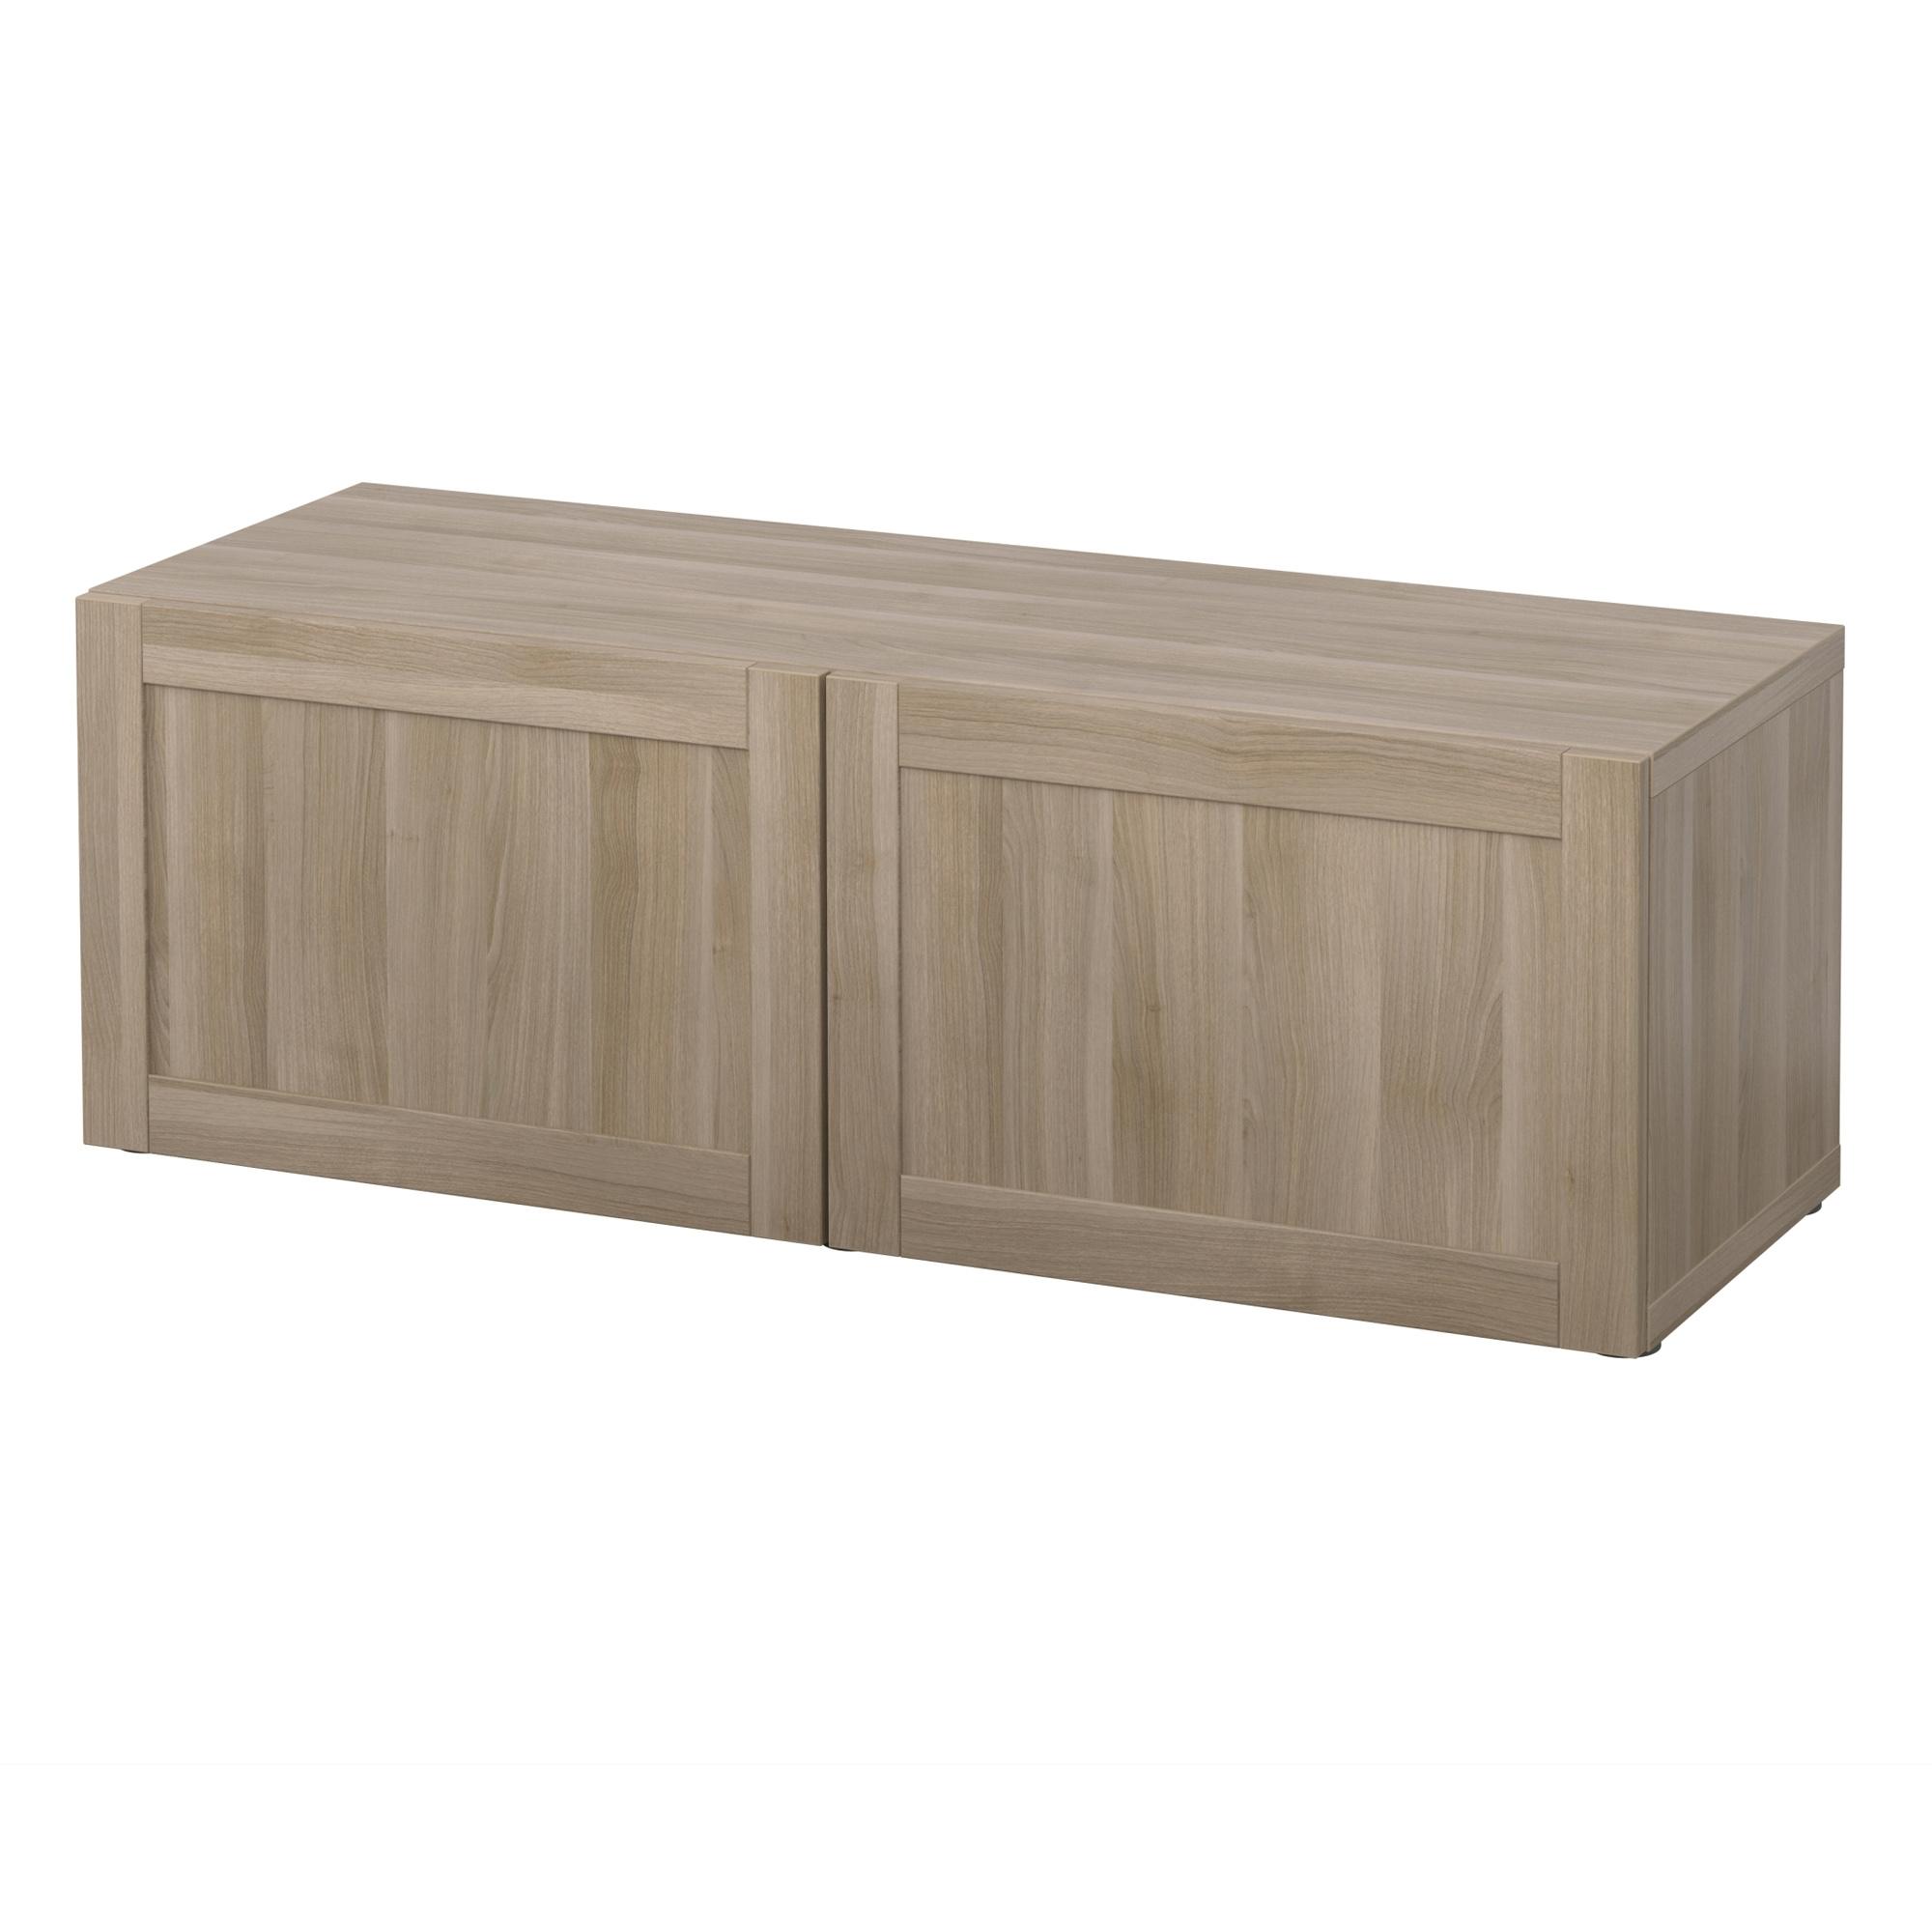 Best estanter a con puertas - Ikea tenerife productos ...